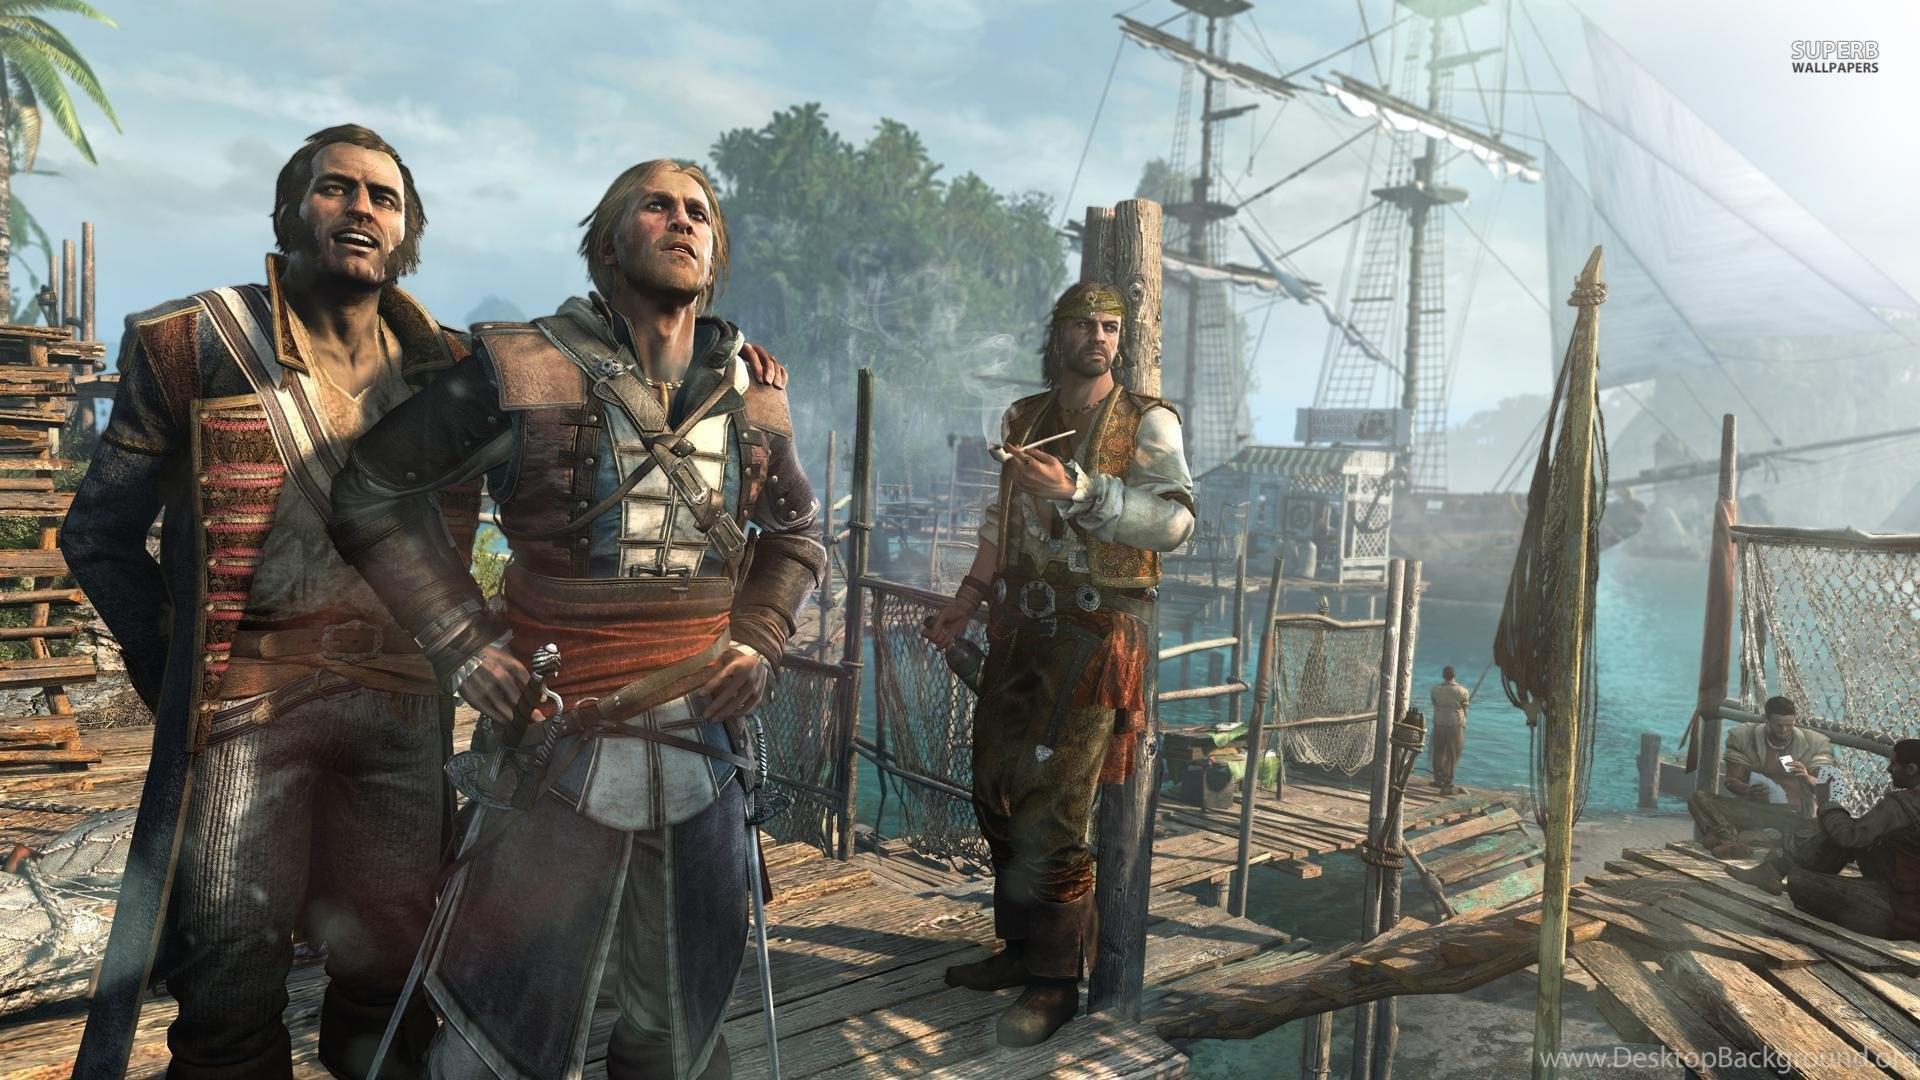 Assassin S Creed Iv Black Flag Wallpapers Game Wallpapers Desktop